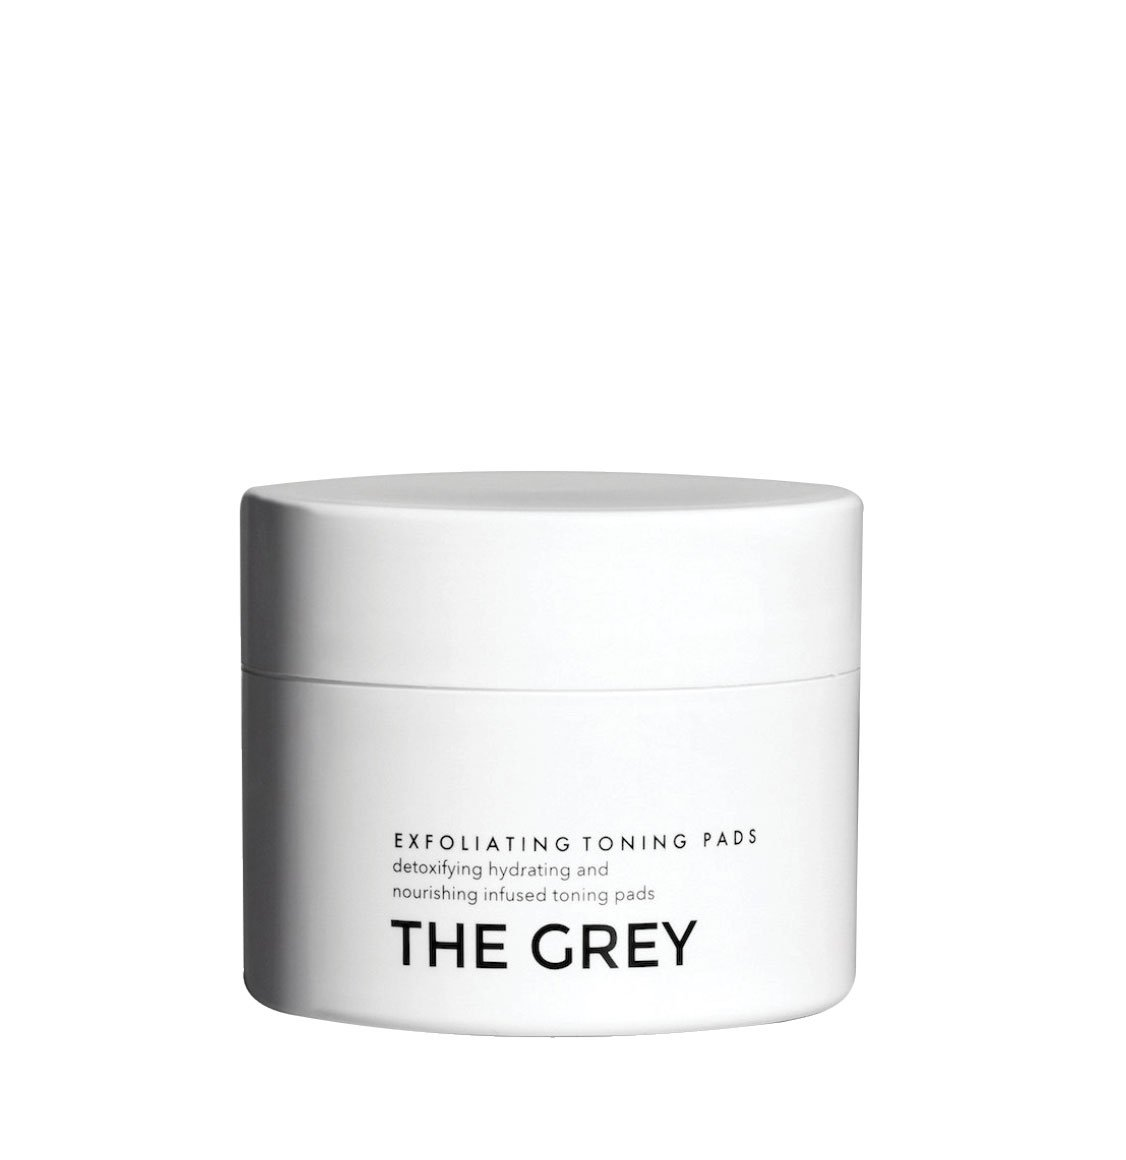 The Grey Exfoliating Toning Pads 60ml